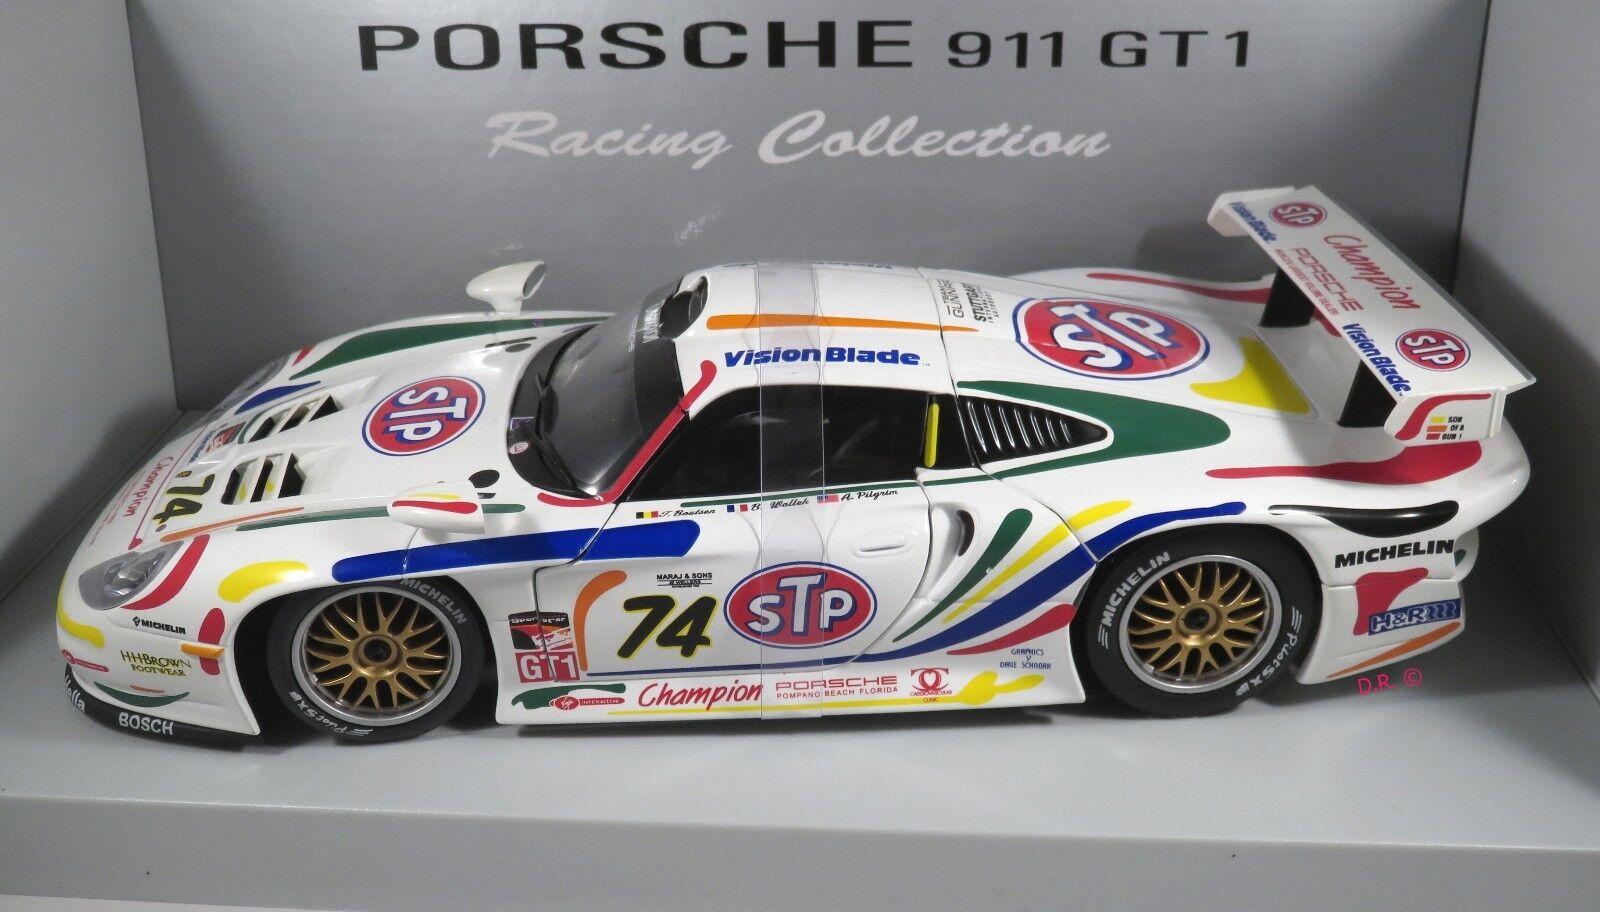 PORSCHE 911 GT1 evo  74 Boutsen Wollek Pilgrim CHAMPION STP SEBRING 1998 UT 1 18